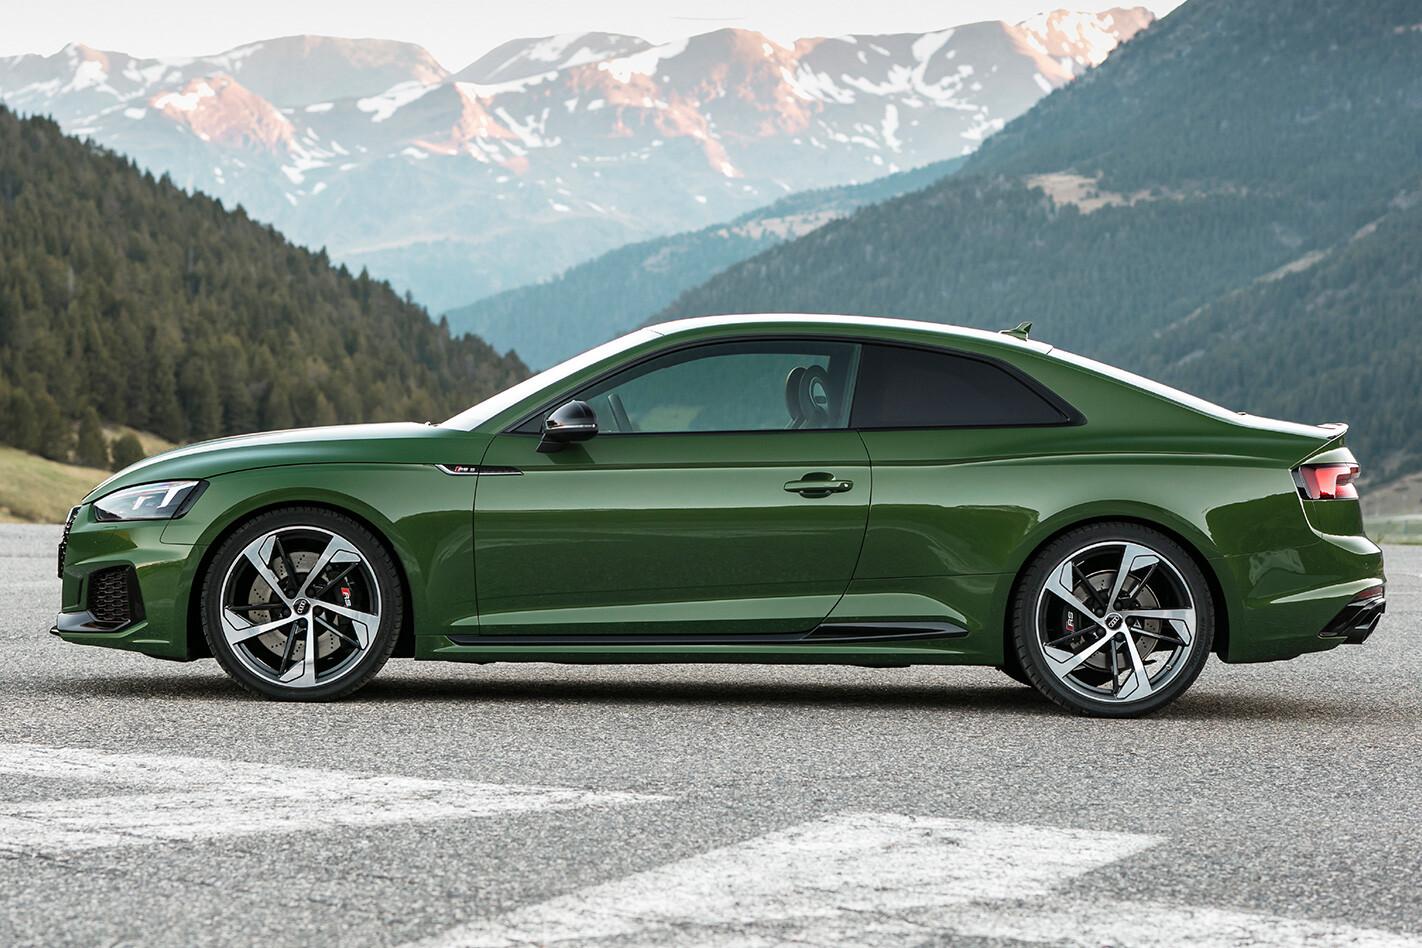 2017 Audi RS5 side profile